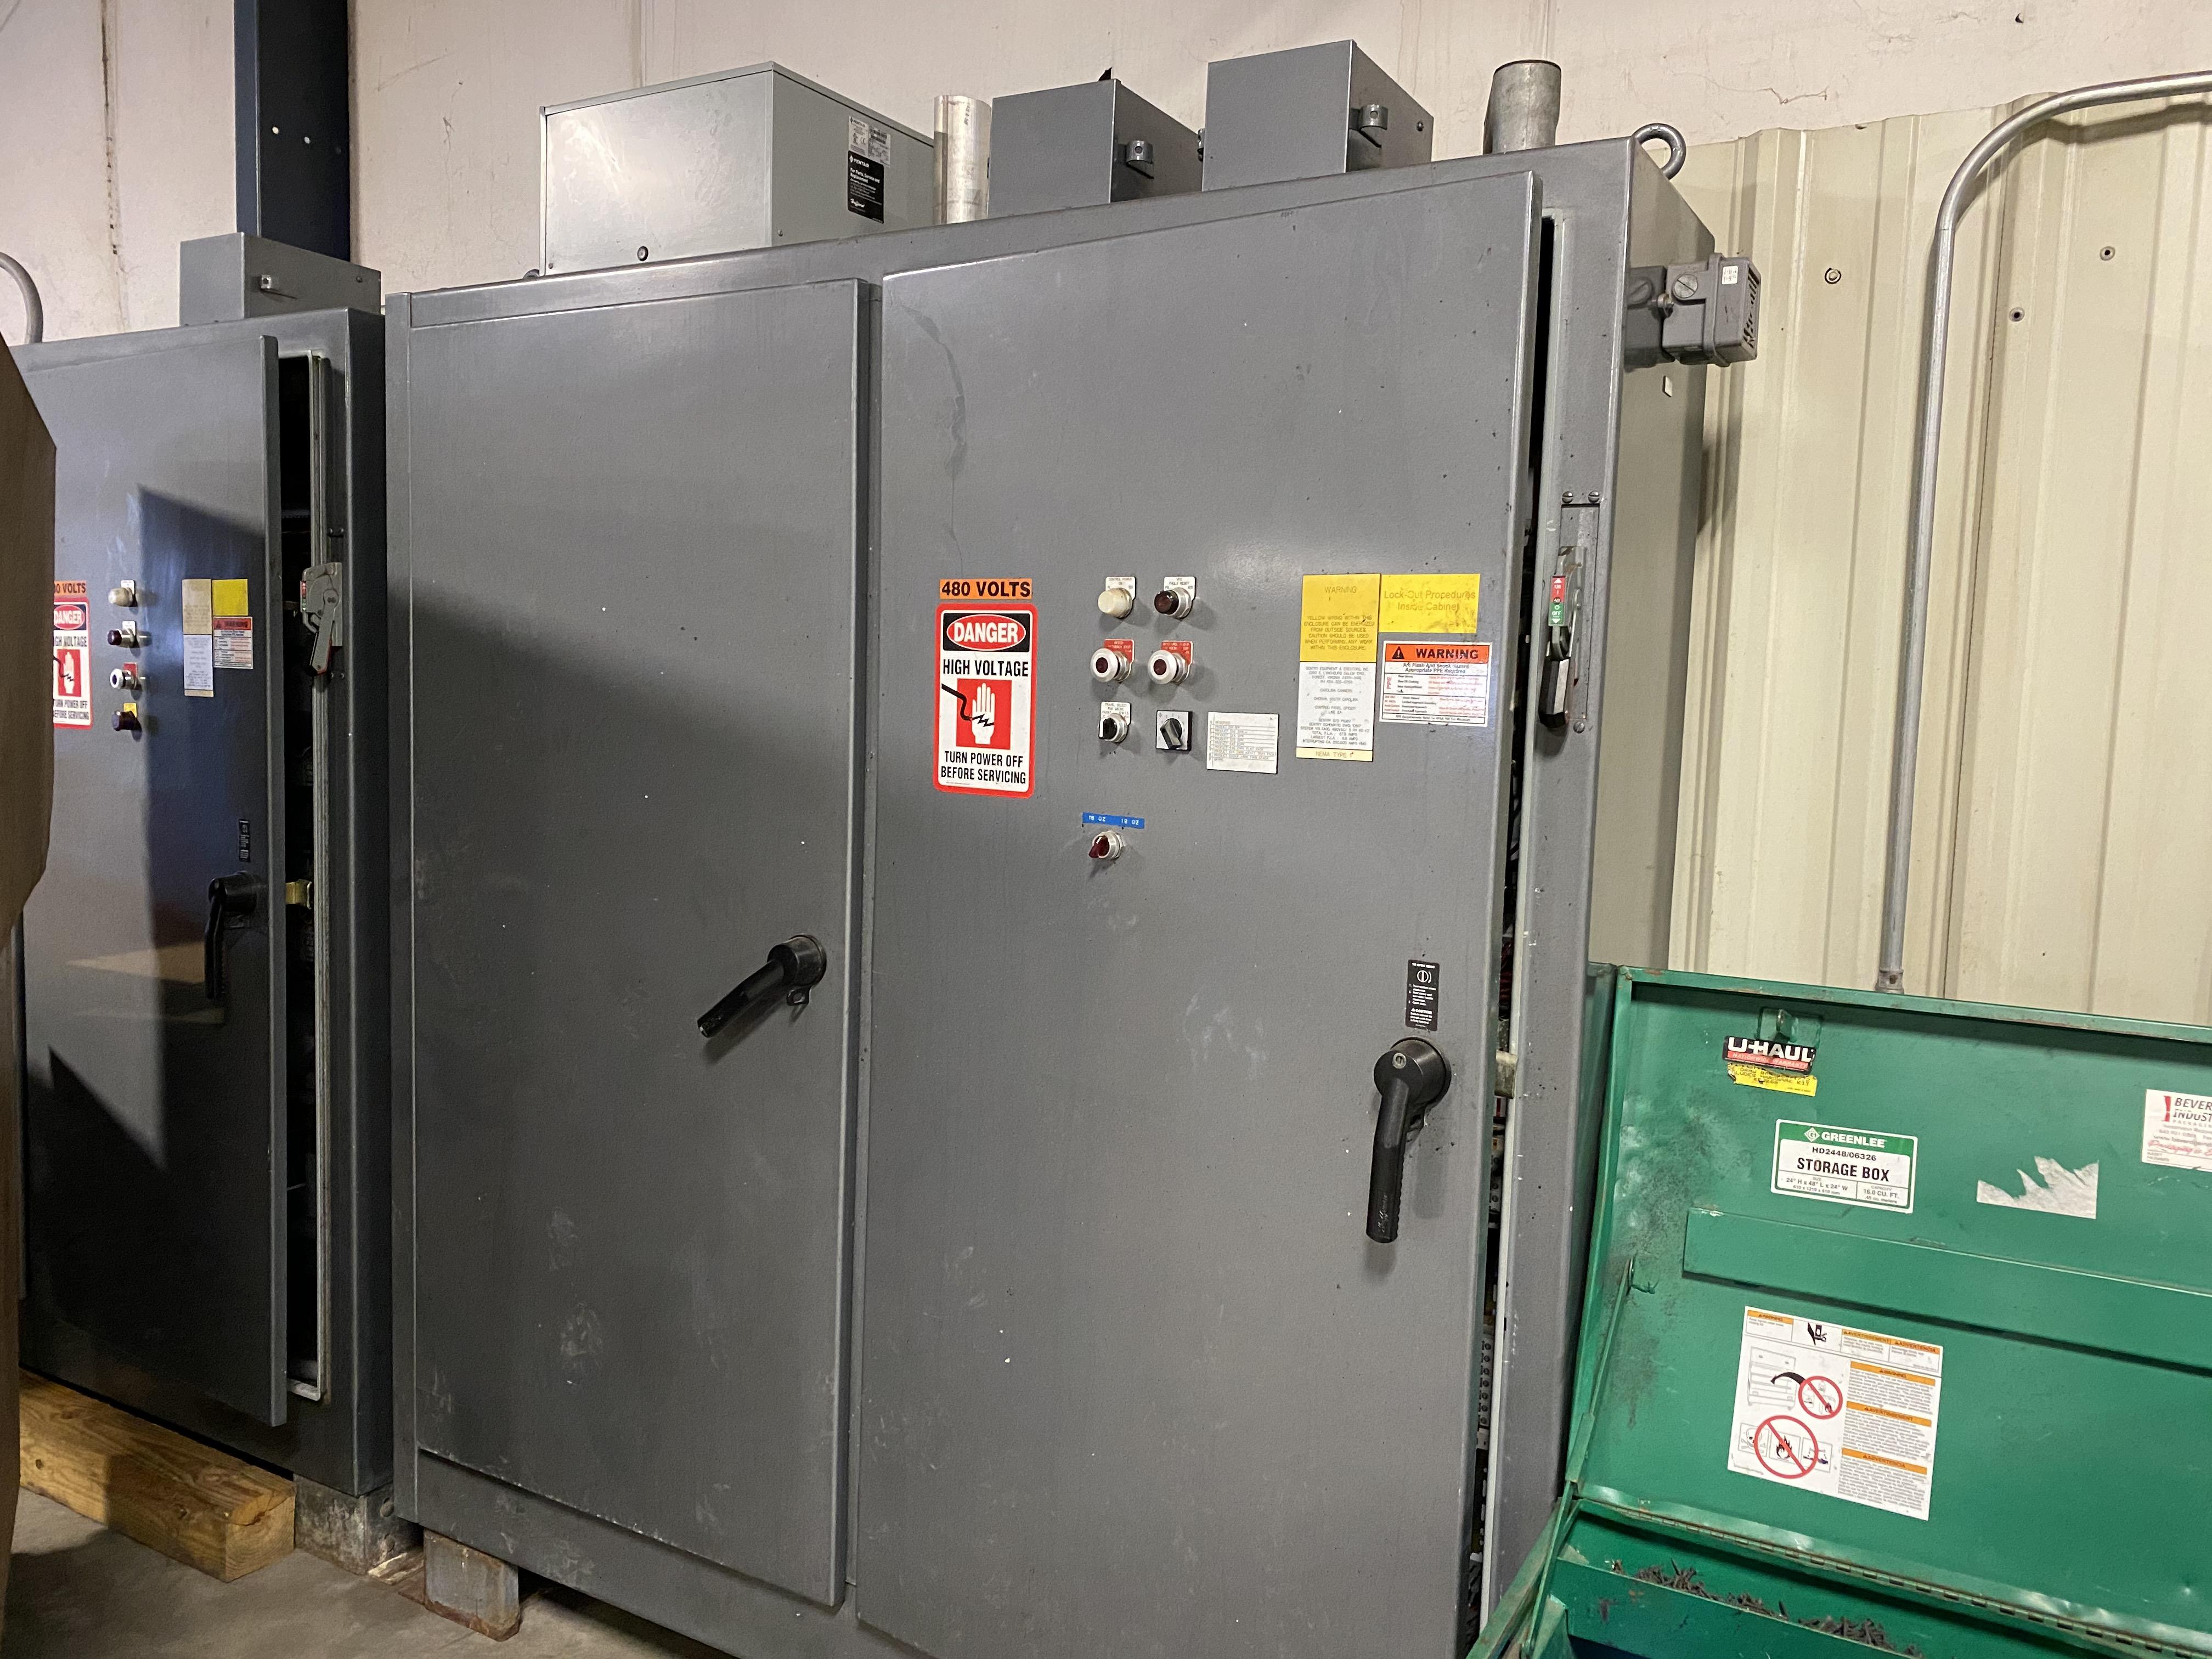 Lot 26A - 2 Door Case Conveyor Control Panel